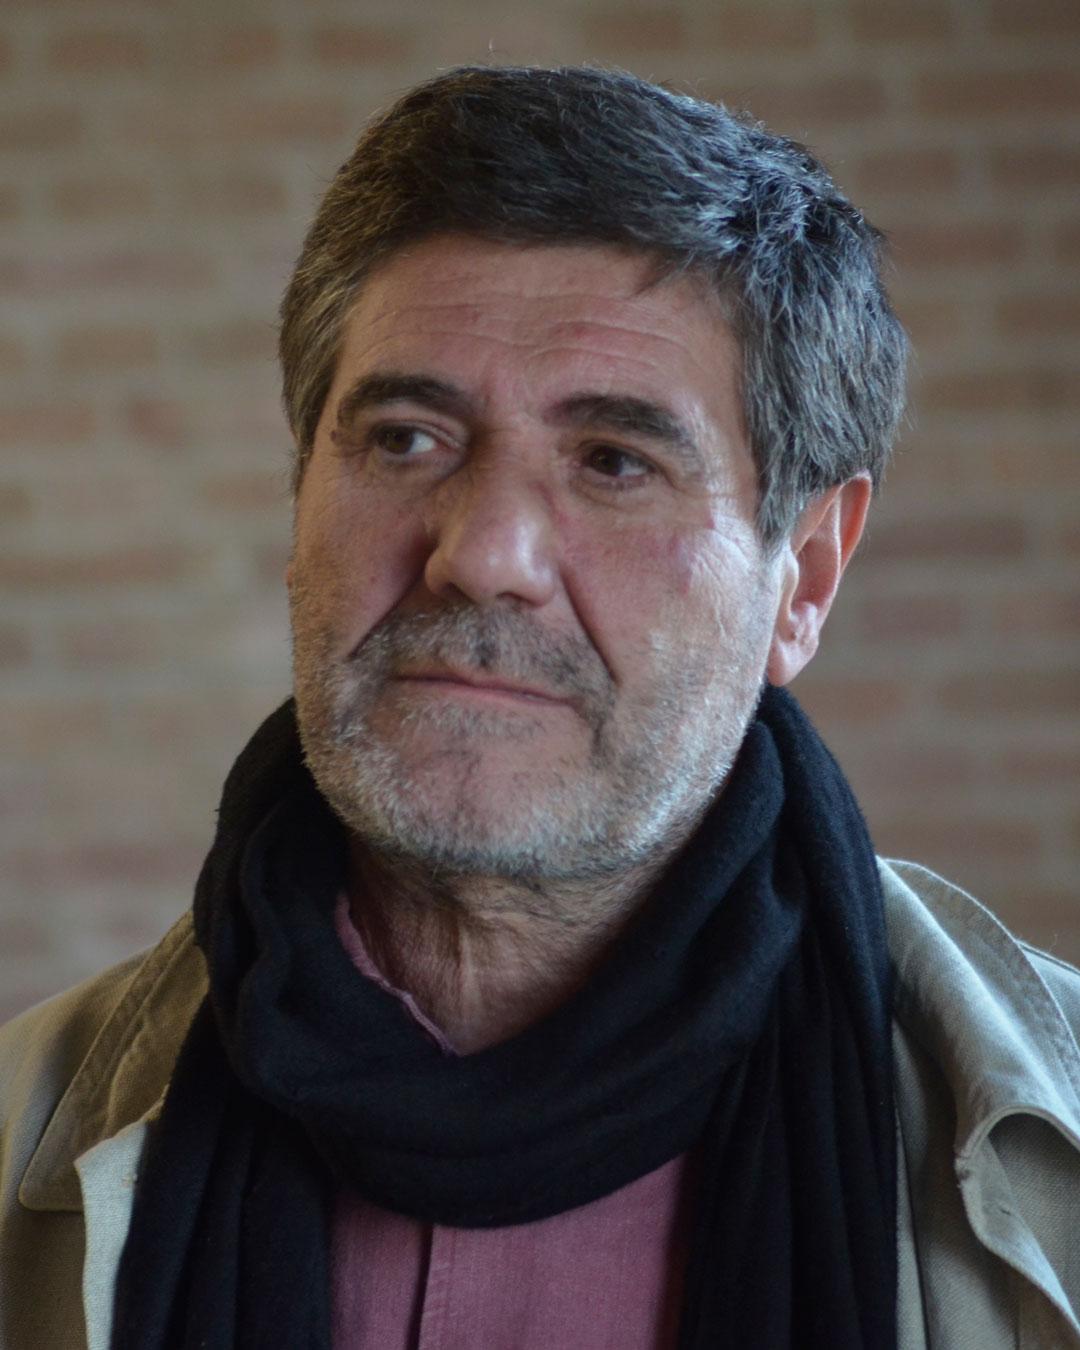 Graziano Visintin, 2012